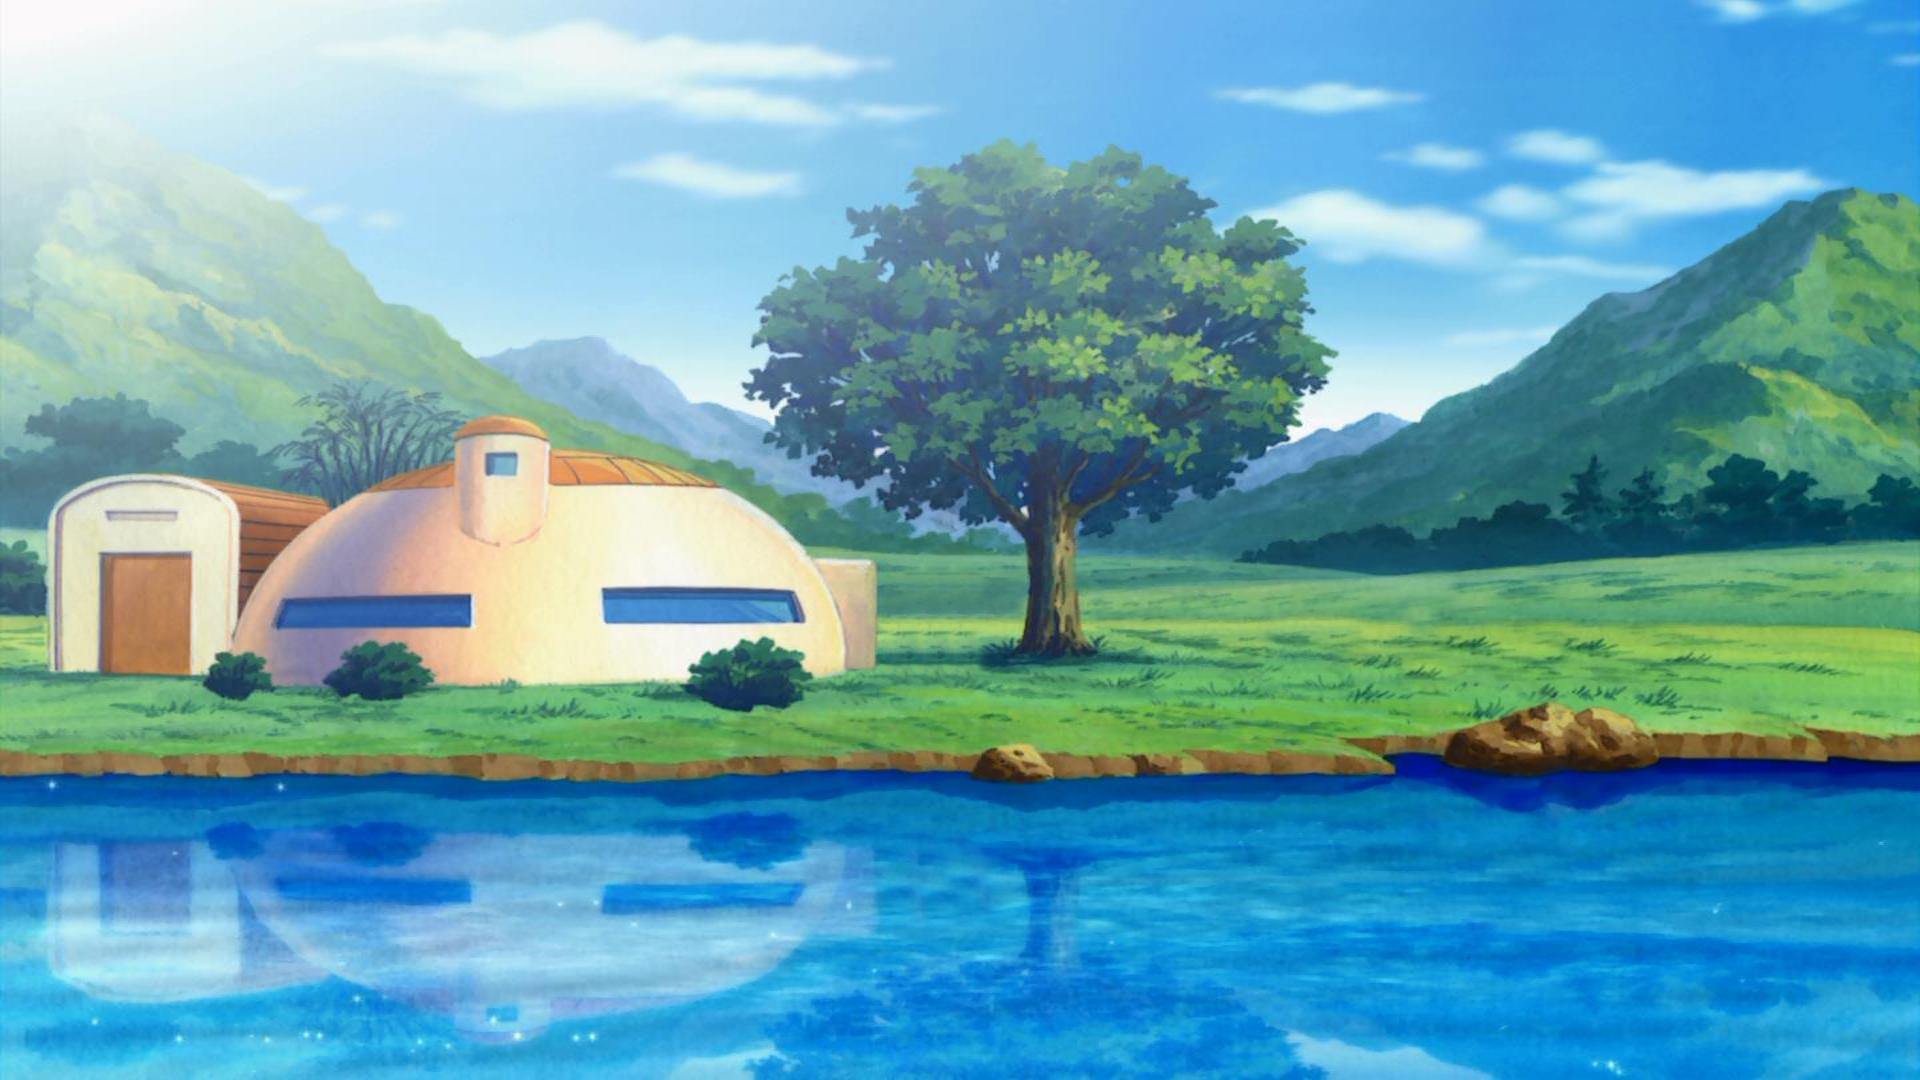 Anime Dragon Ball Z Goku Wallpaper Dragon Ball Scenery